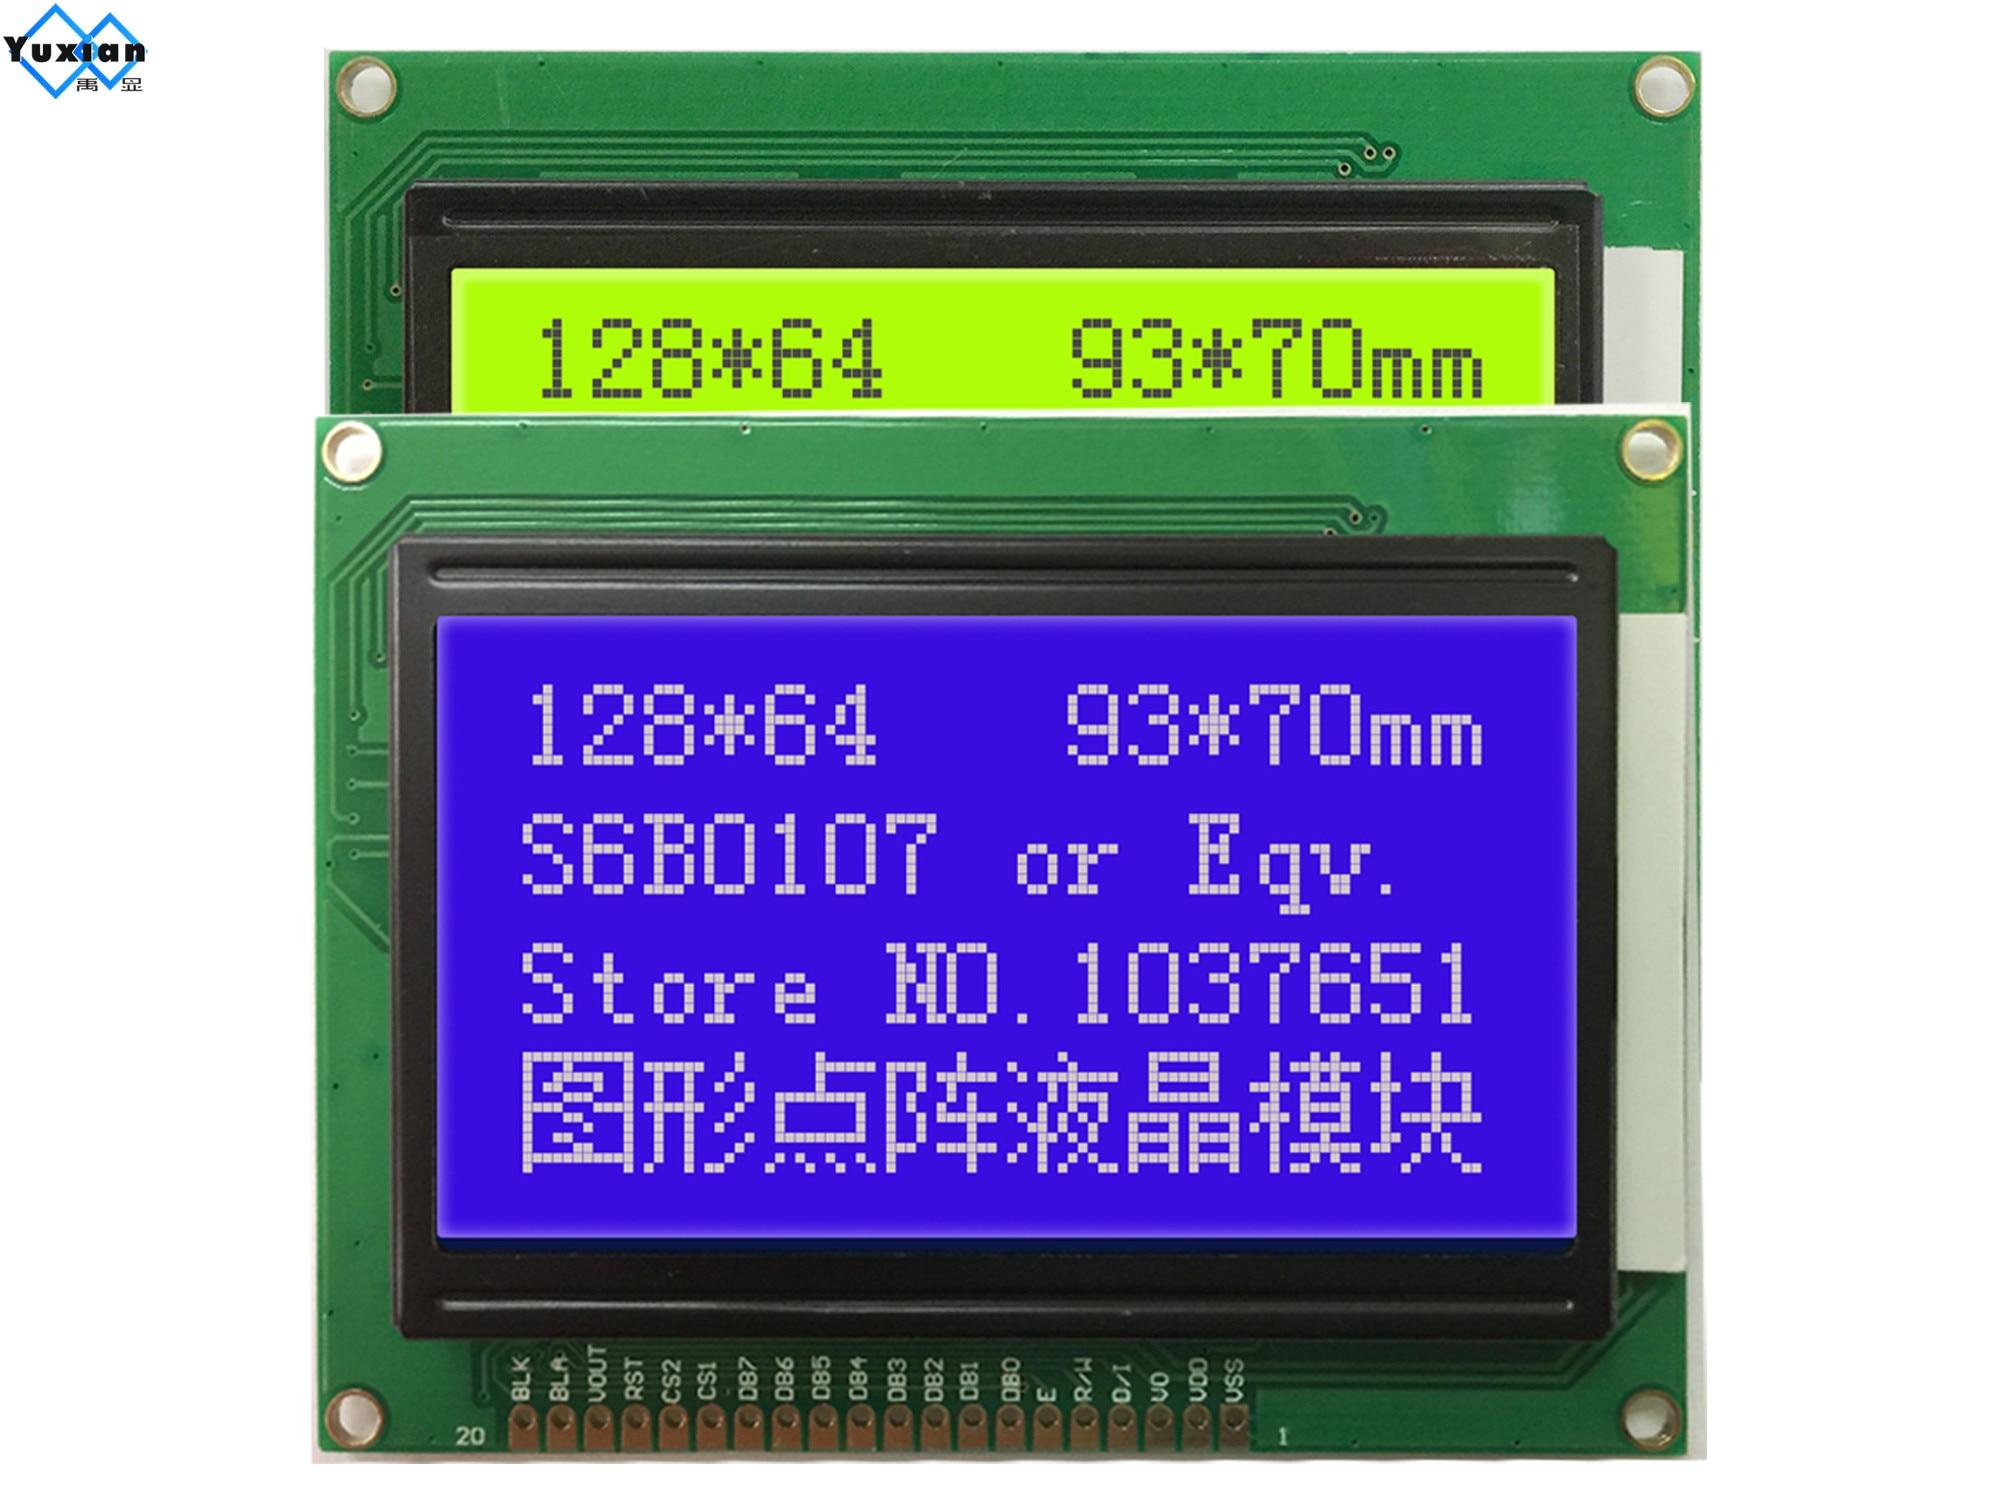 12864  Lcd Display Module 5v Green Blue  NT7108  12864A  20pin Hot Selling